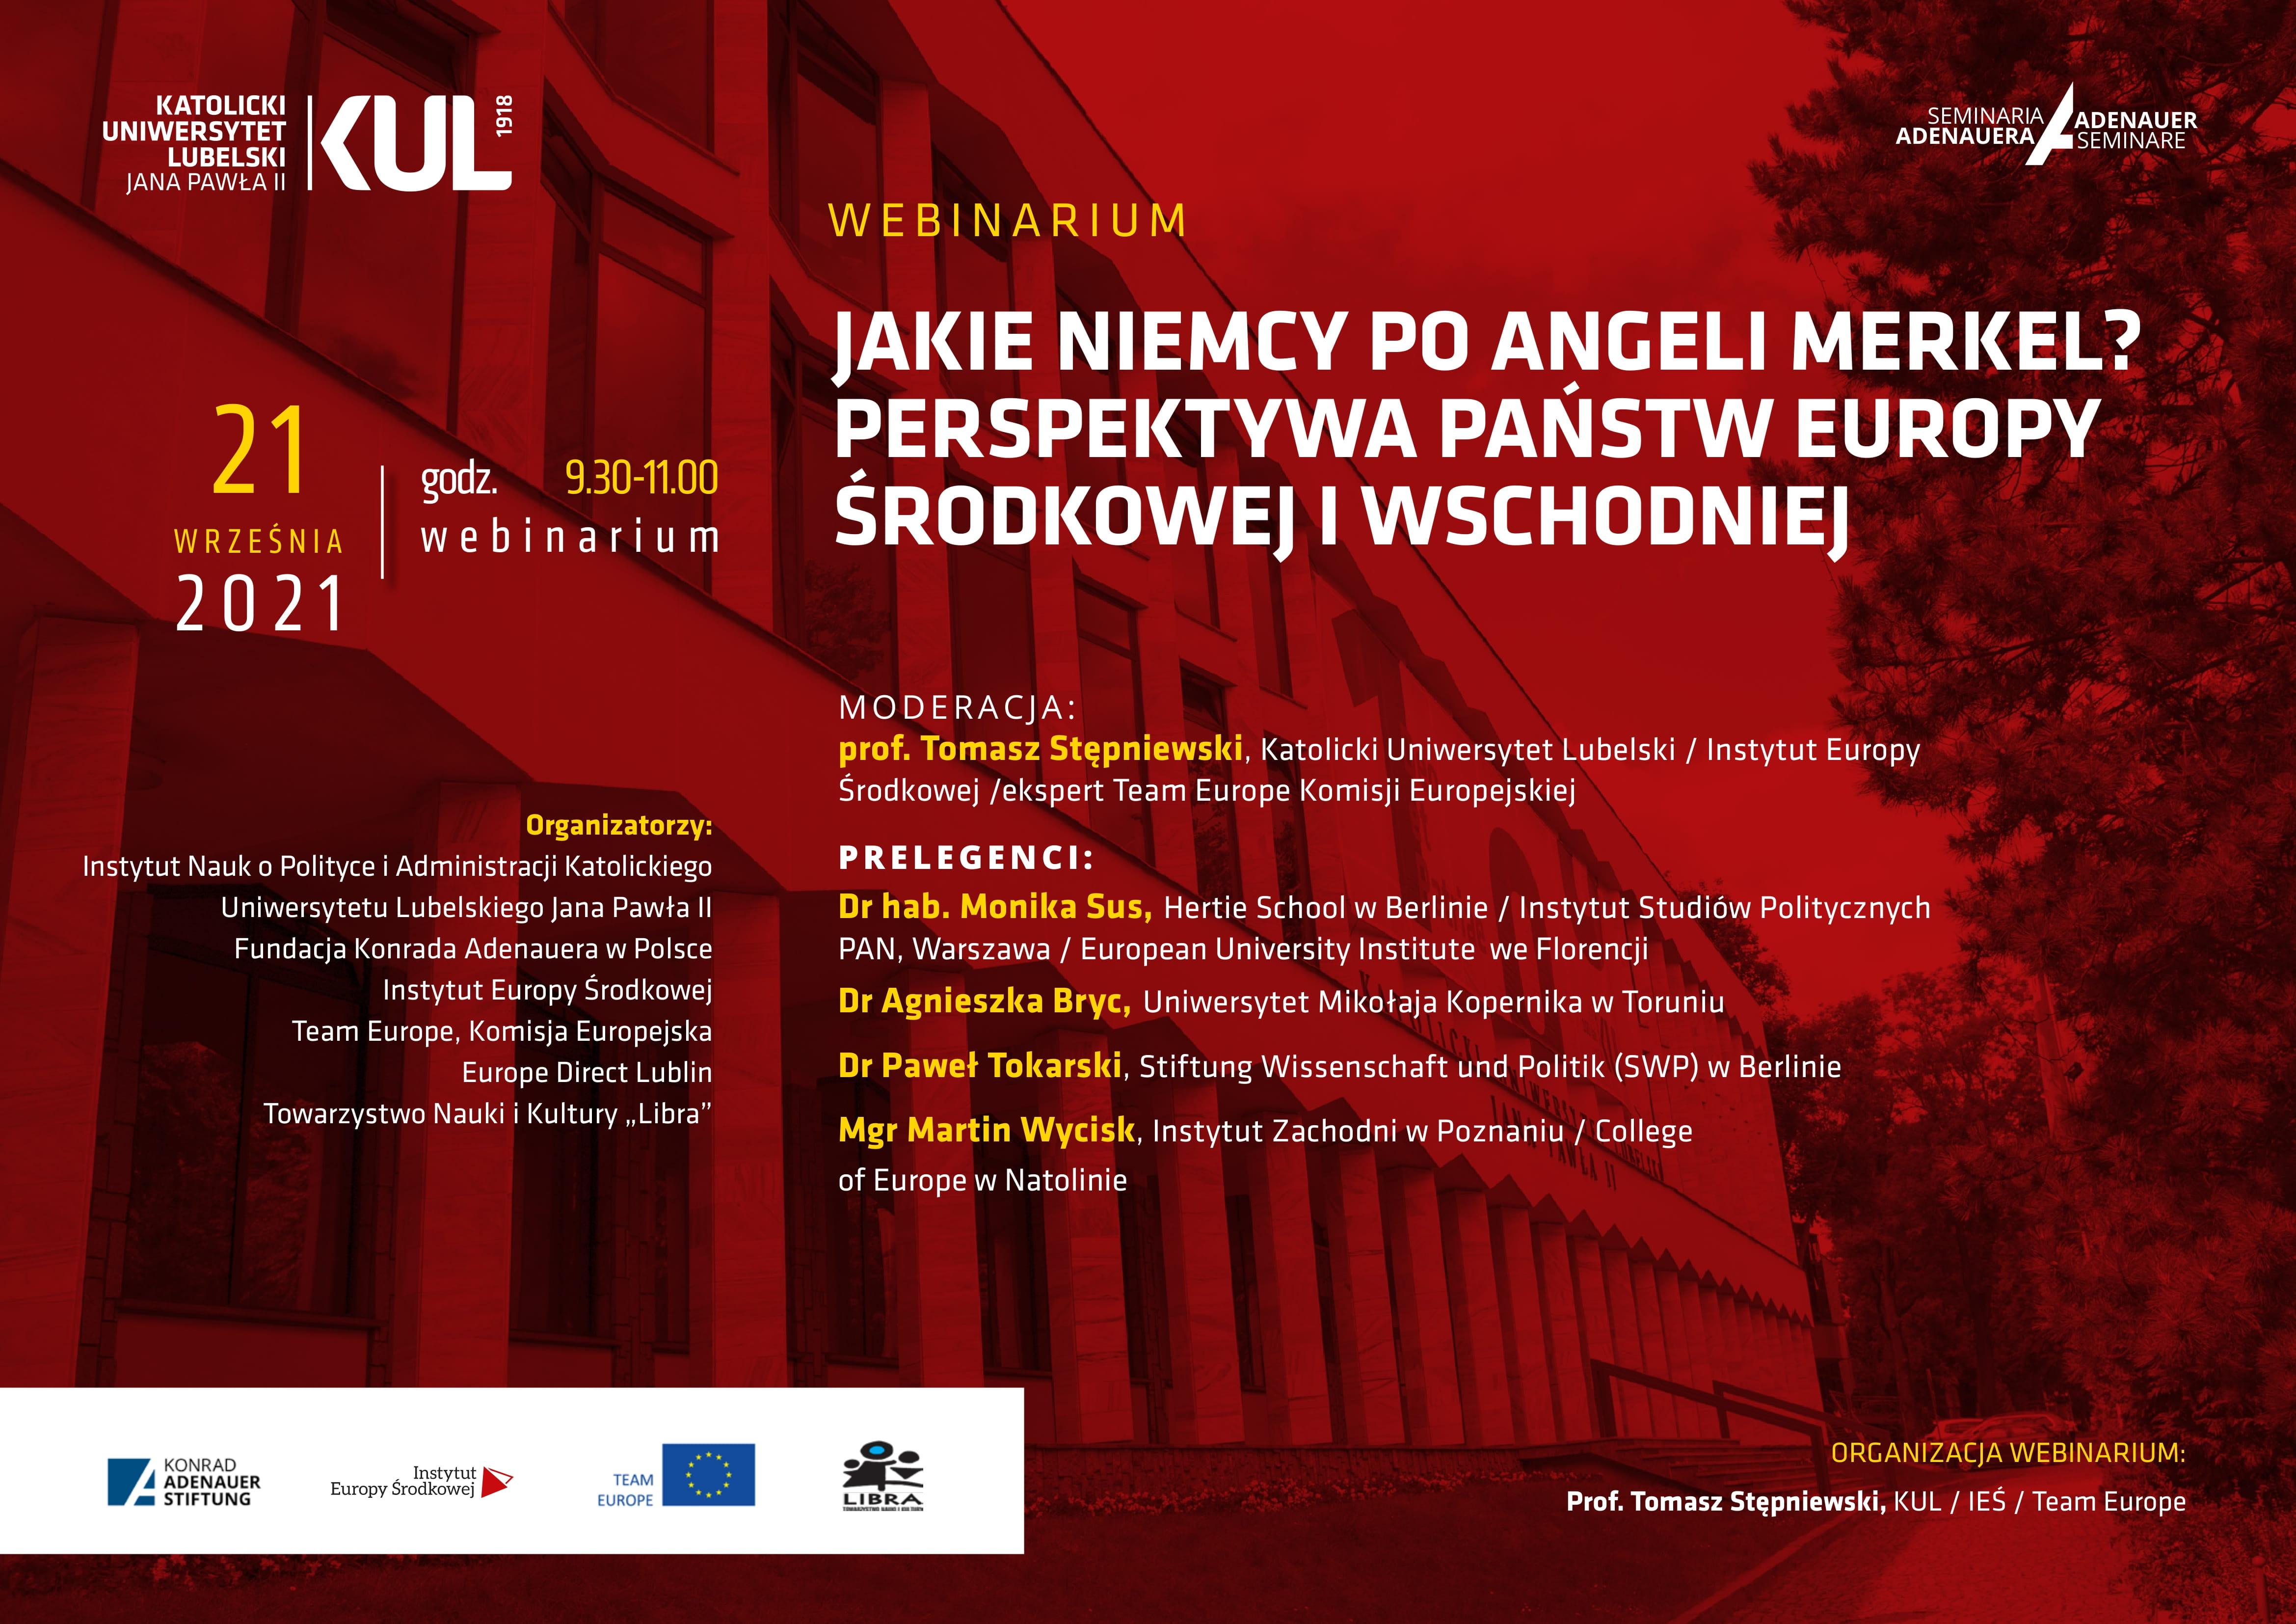 plakat_webinarum_seminaria_adenaera_21.09-1.jpg